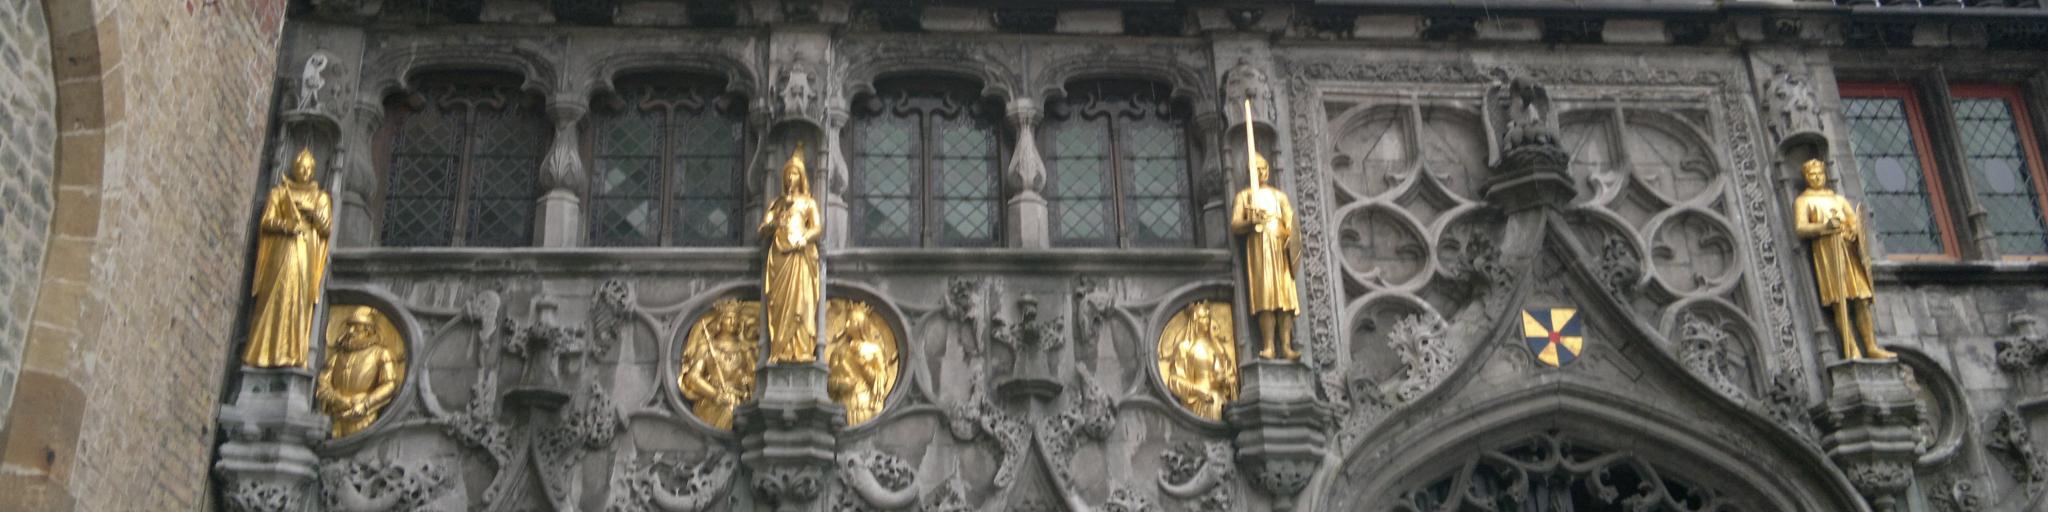 Basilica of the Holy Blood, Belgium, Bruges